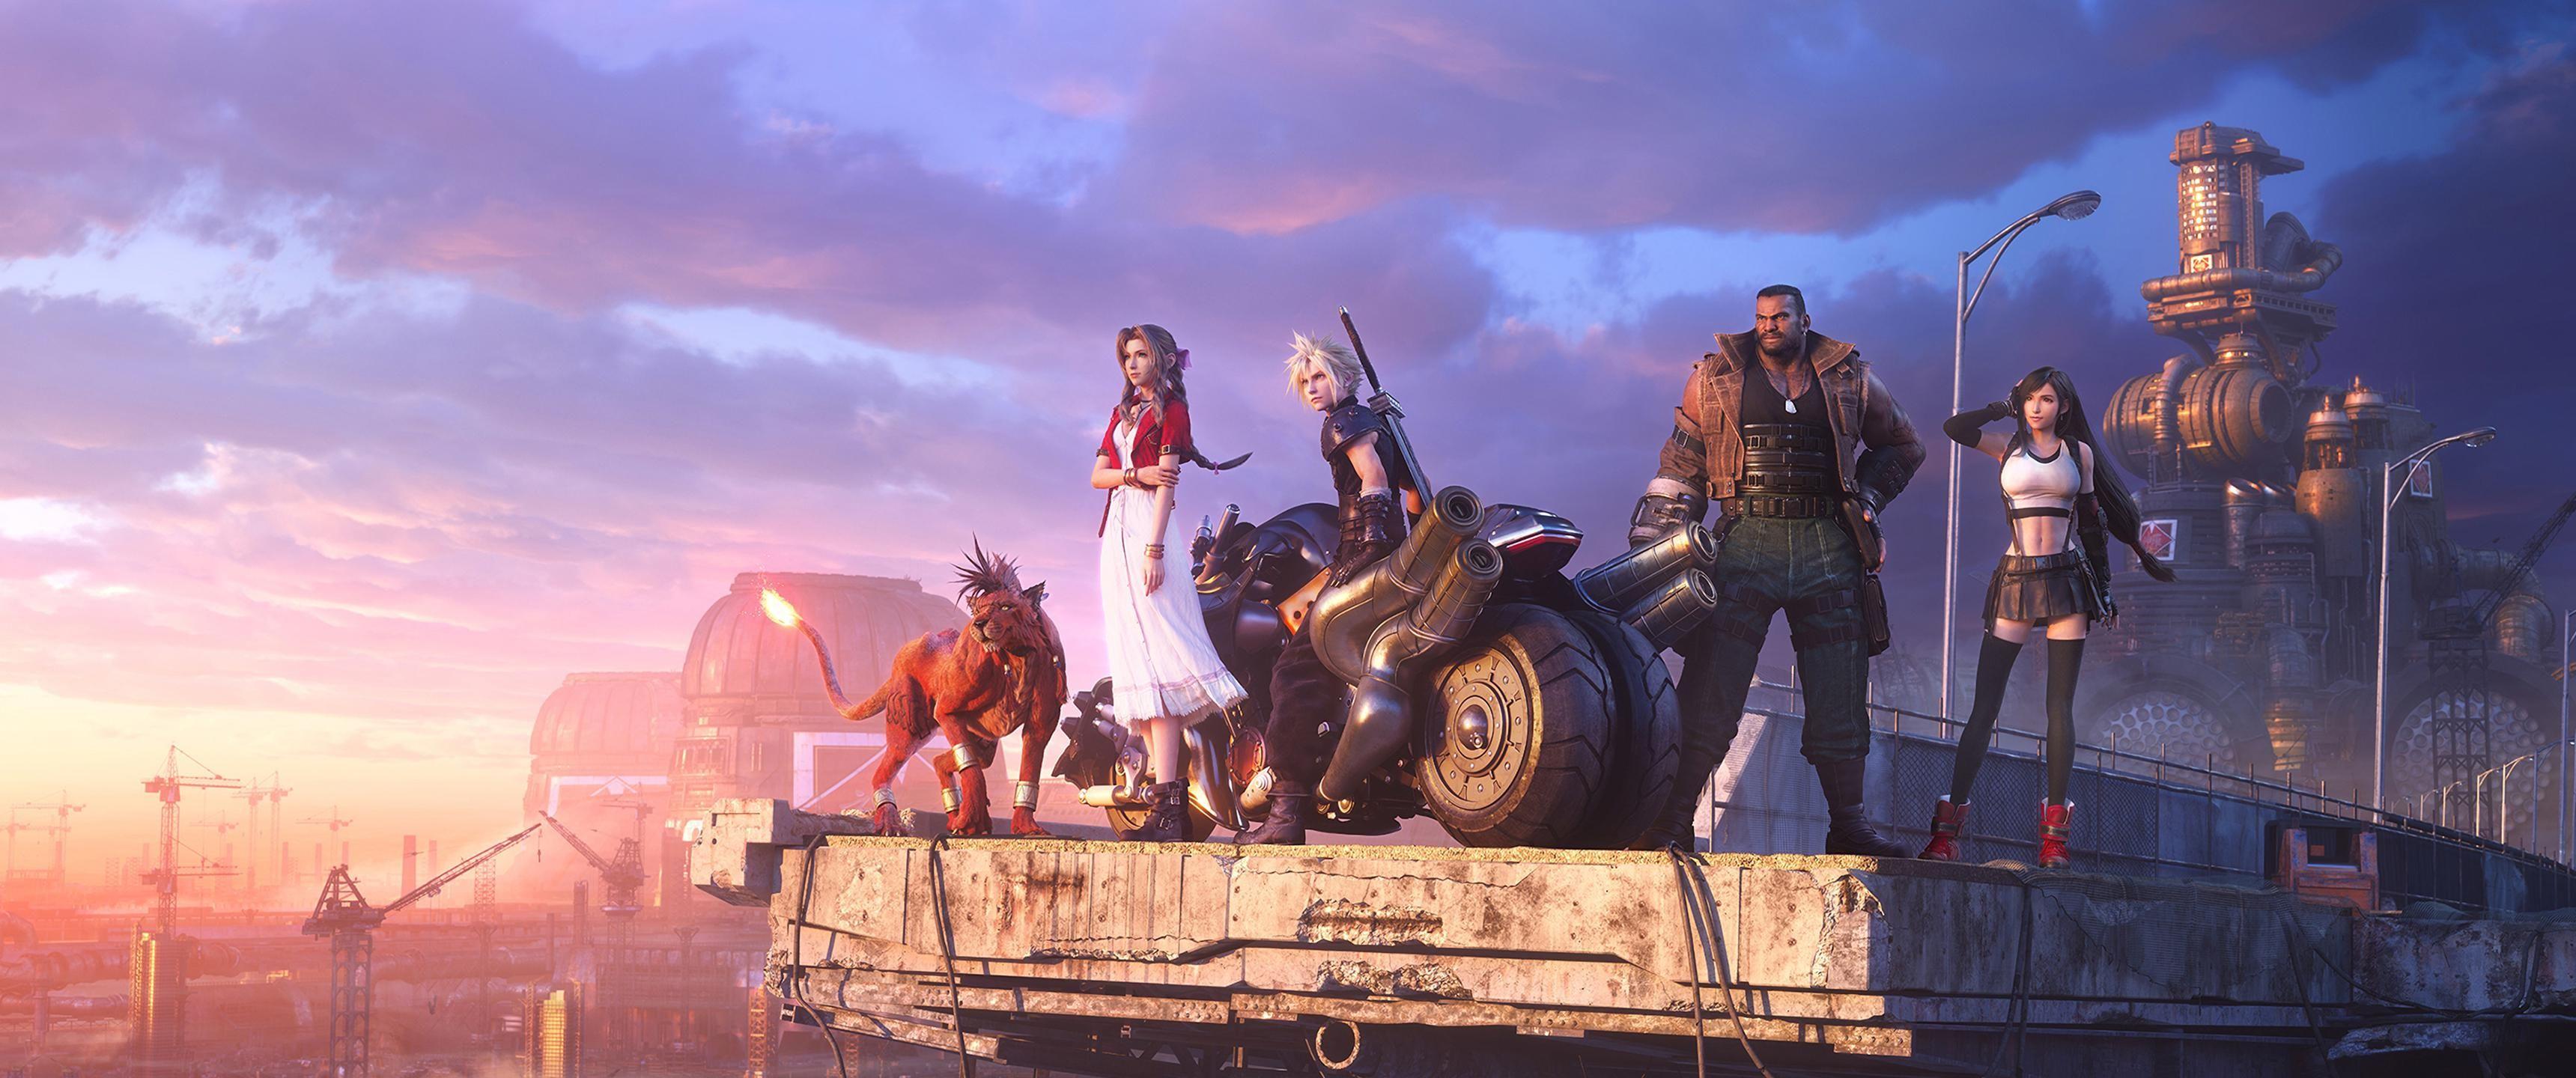 Final Fantasy Vii Remake Final Fantasy Vii Remake Final Fantasy Vii Final Fantasy